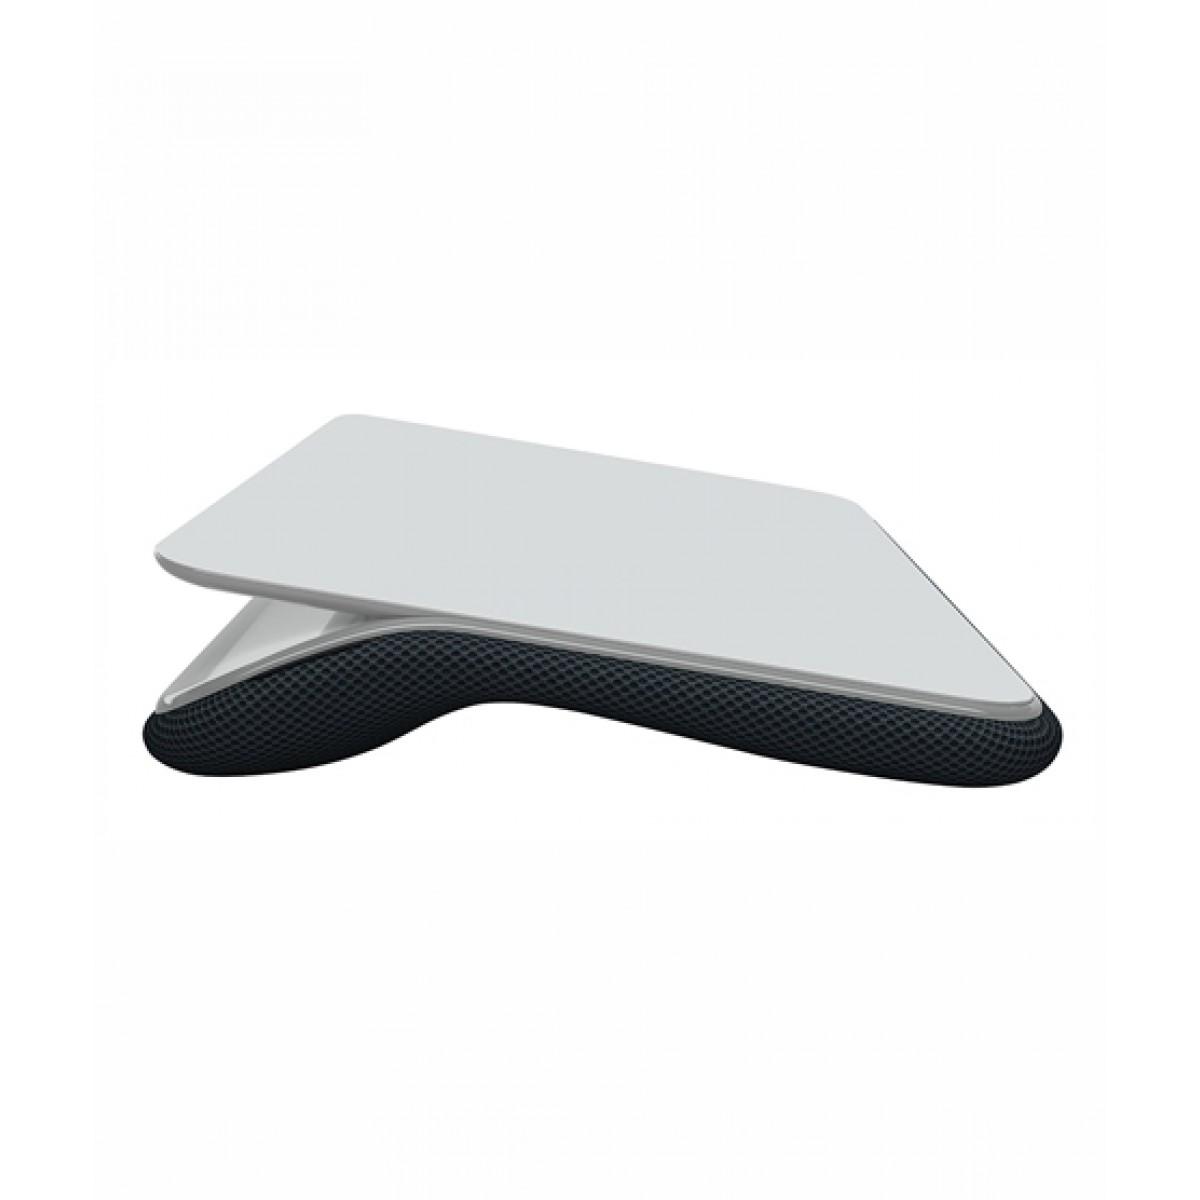 922b784c360 Logitech Comfort Lapdesk (N500) Price in Pakistan | Buy Logitech Comfort  Lapdesk | iShopping.pk